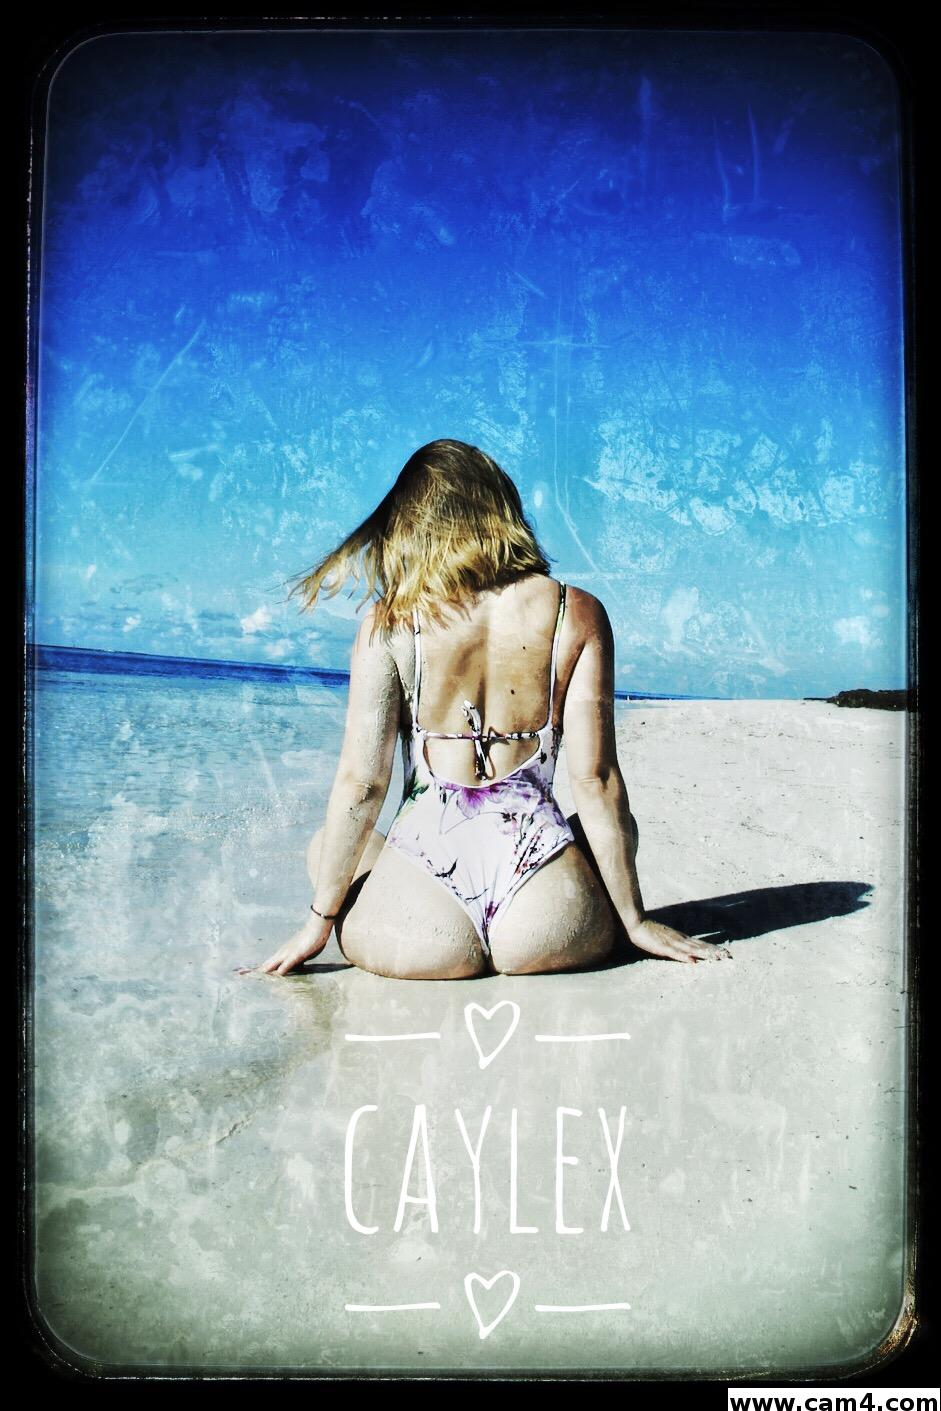 Caylex1?s=upqjrh4kvlwuinrvwra+3n2h8re2i0ffr3xz1zhw4wi=